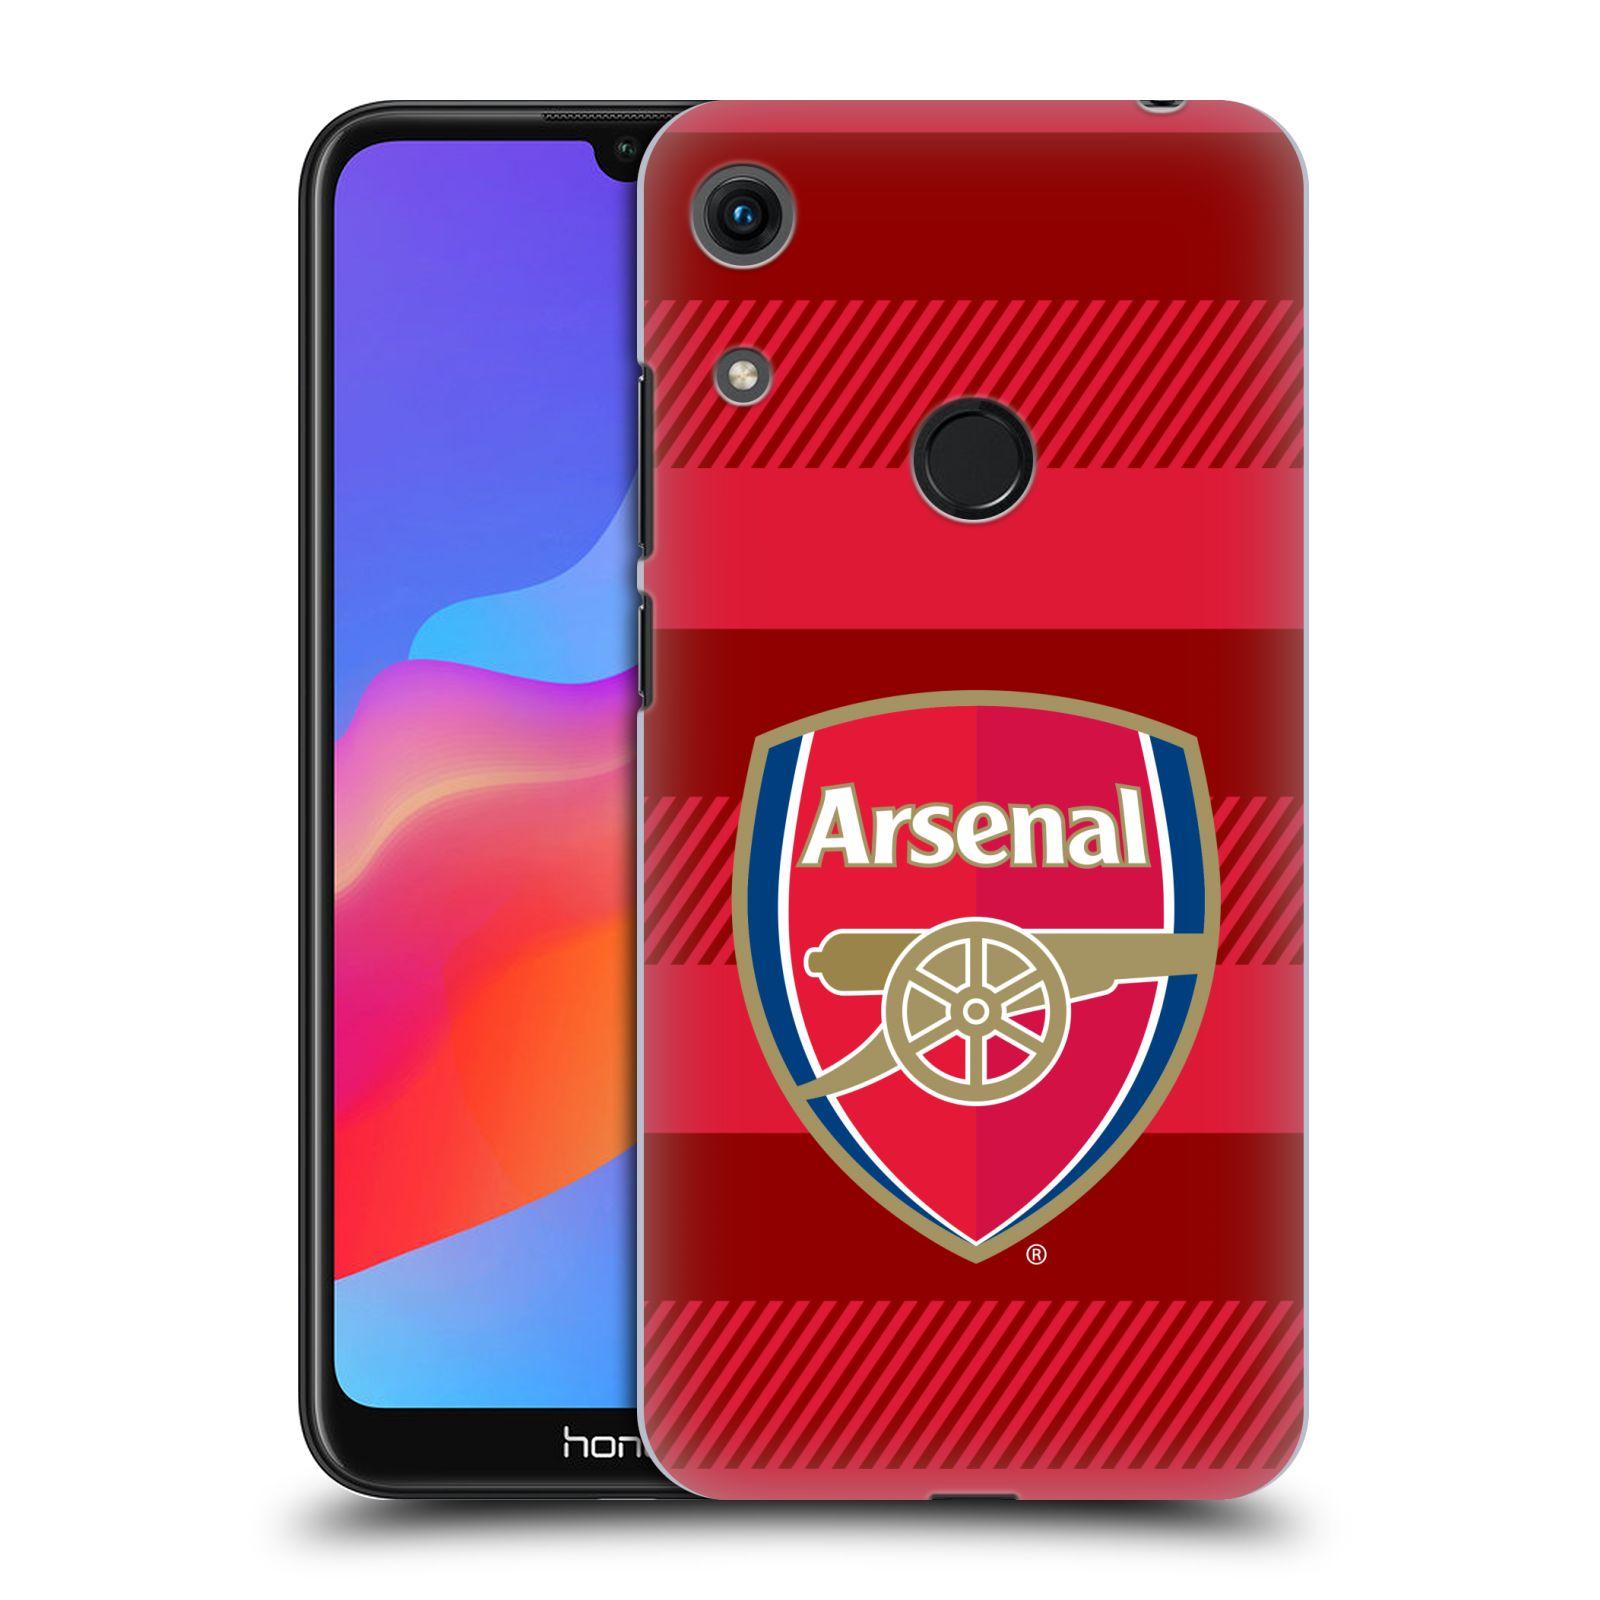 Plastové pouzdro na mobil Honor 8A - Head Case - Arsenal FC - Logo s pruhy